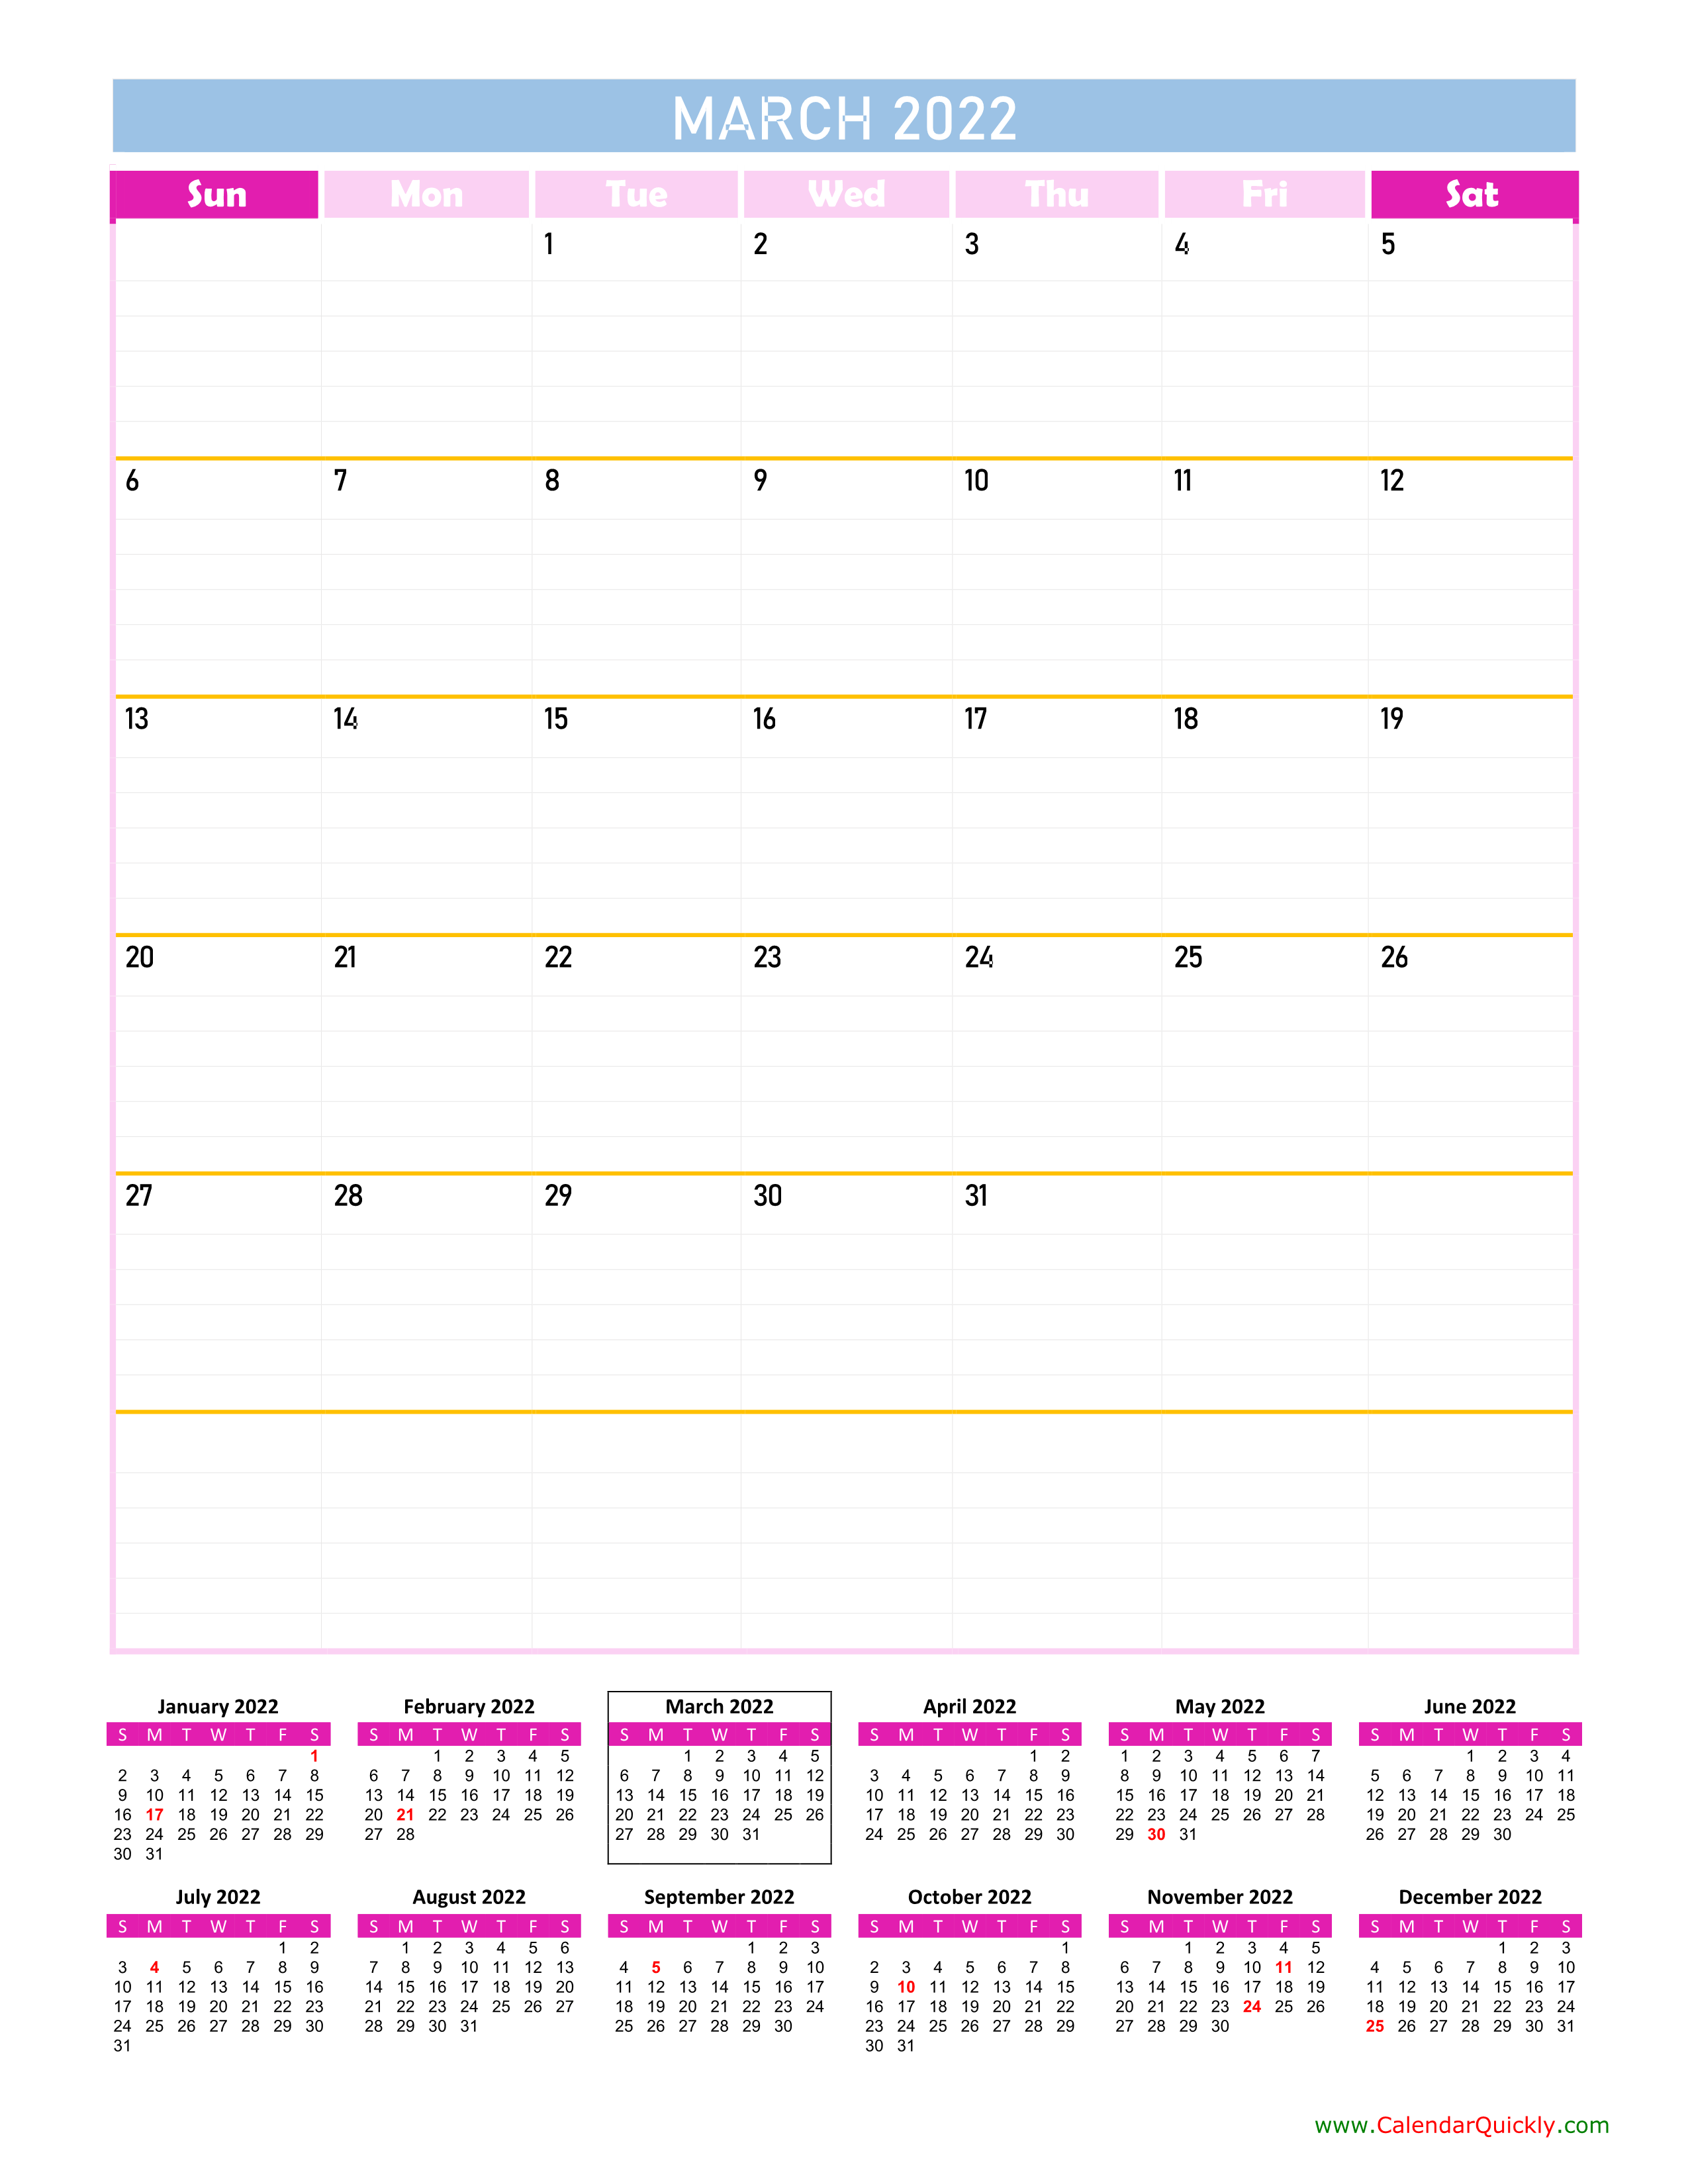 March Calendar 2022 Vertical | Calendar Quickly Intended For 2022 Calendar Feb March April